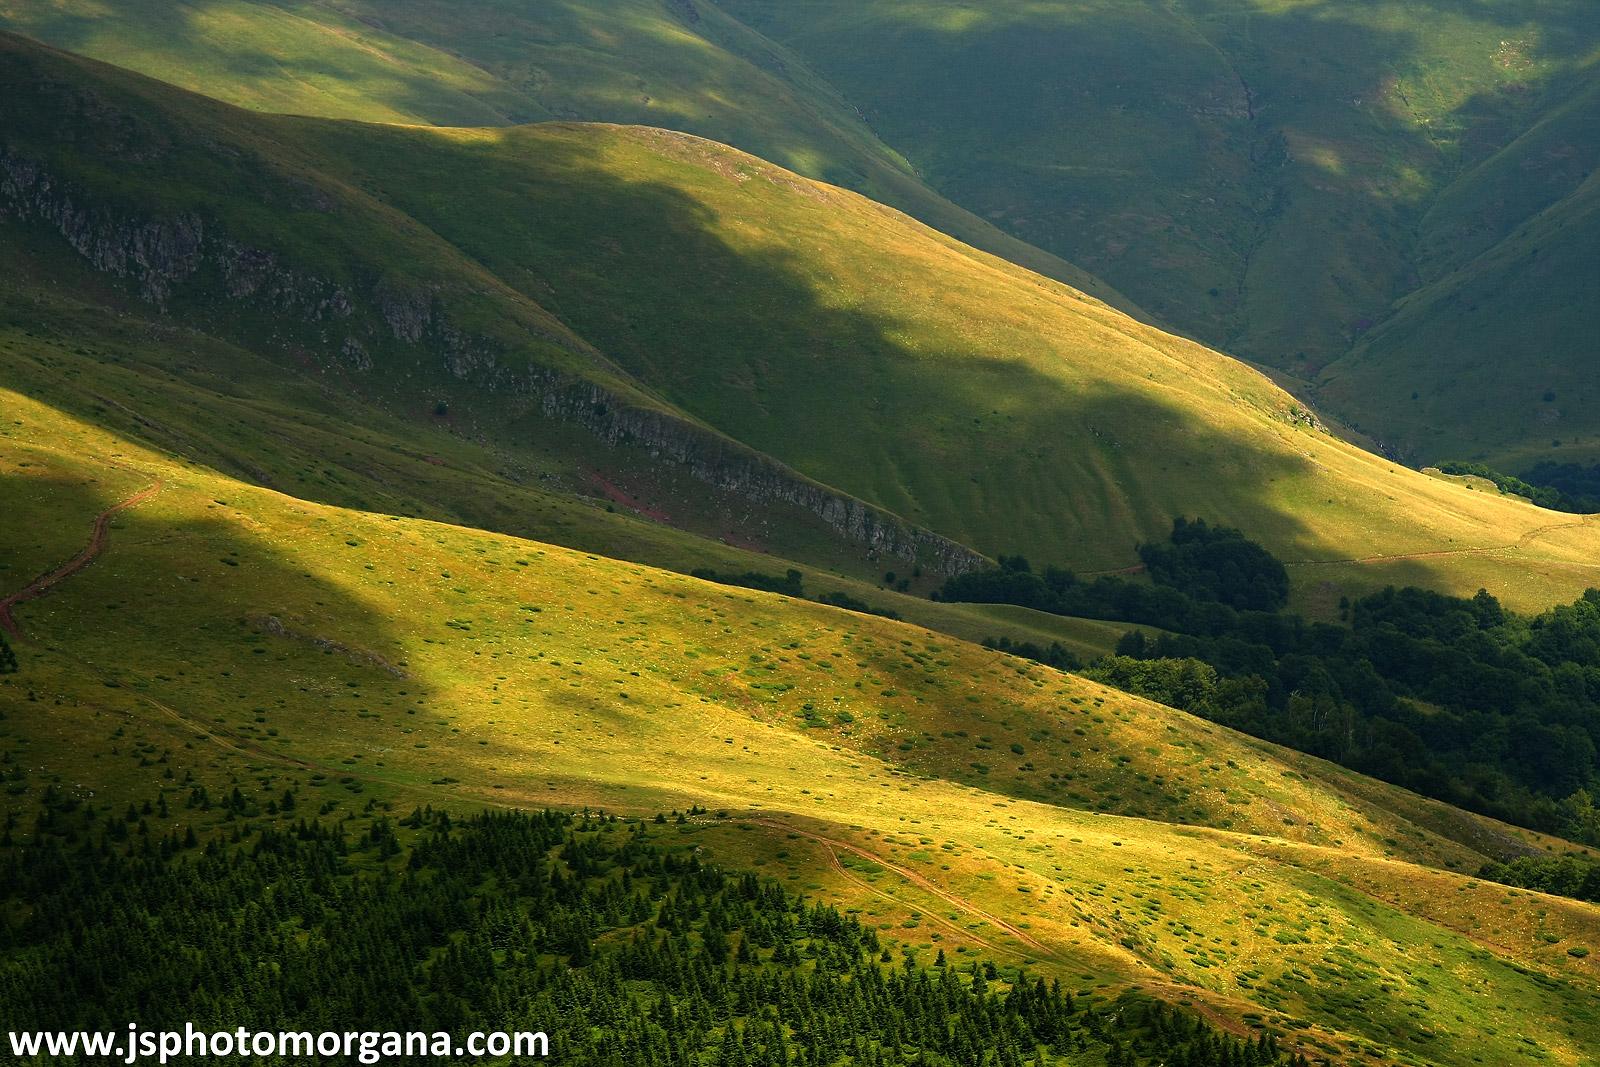 Livade Stare planine